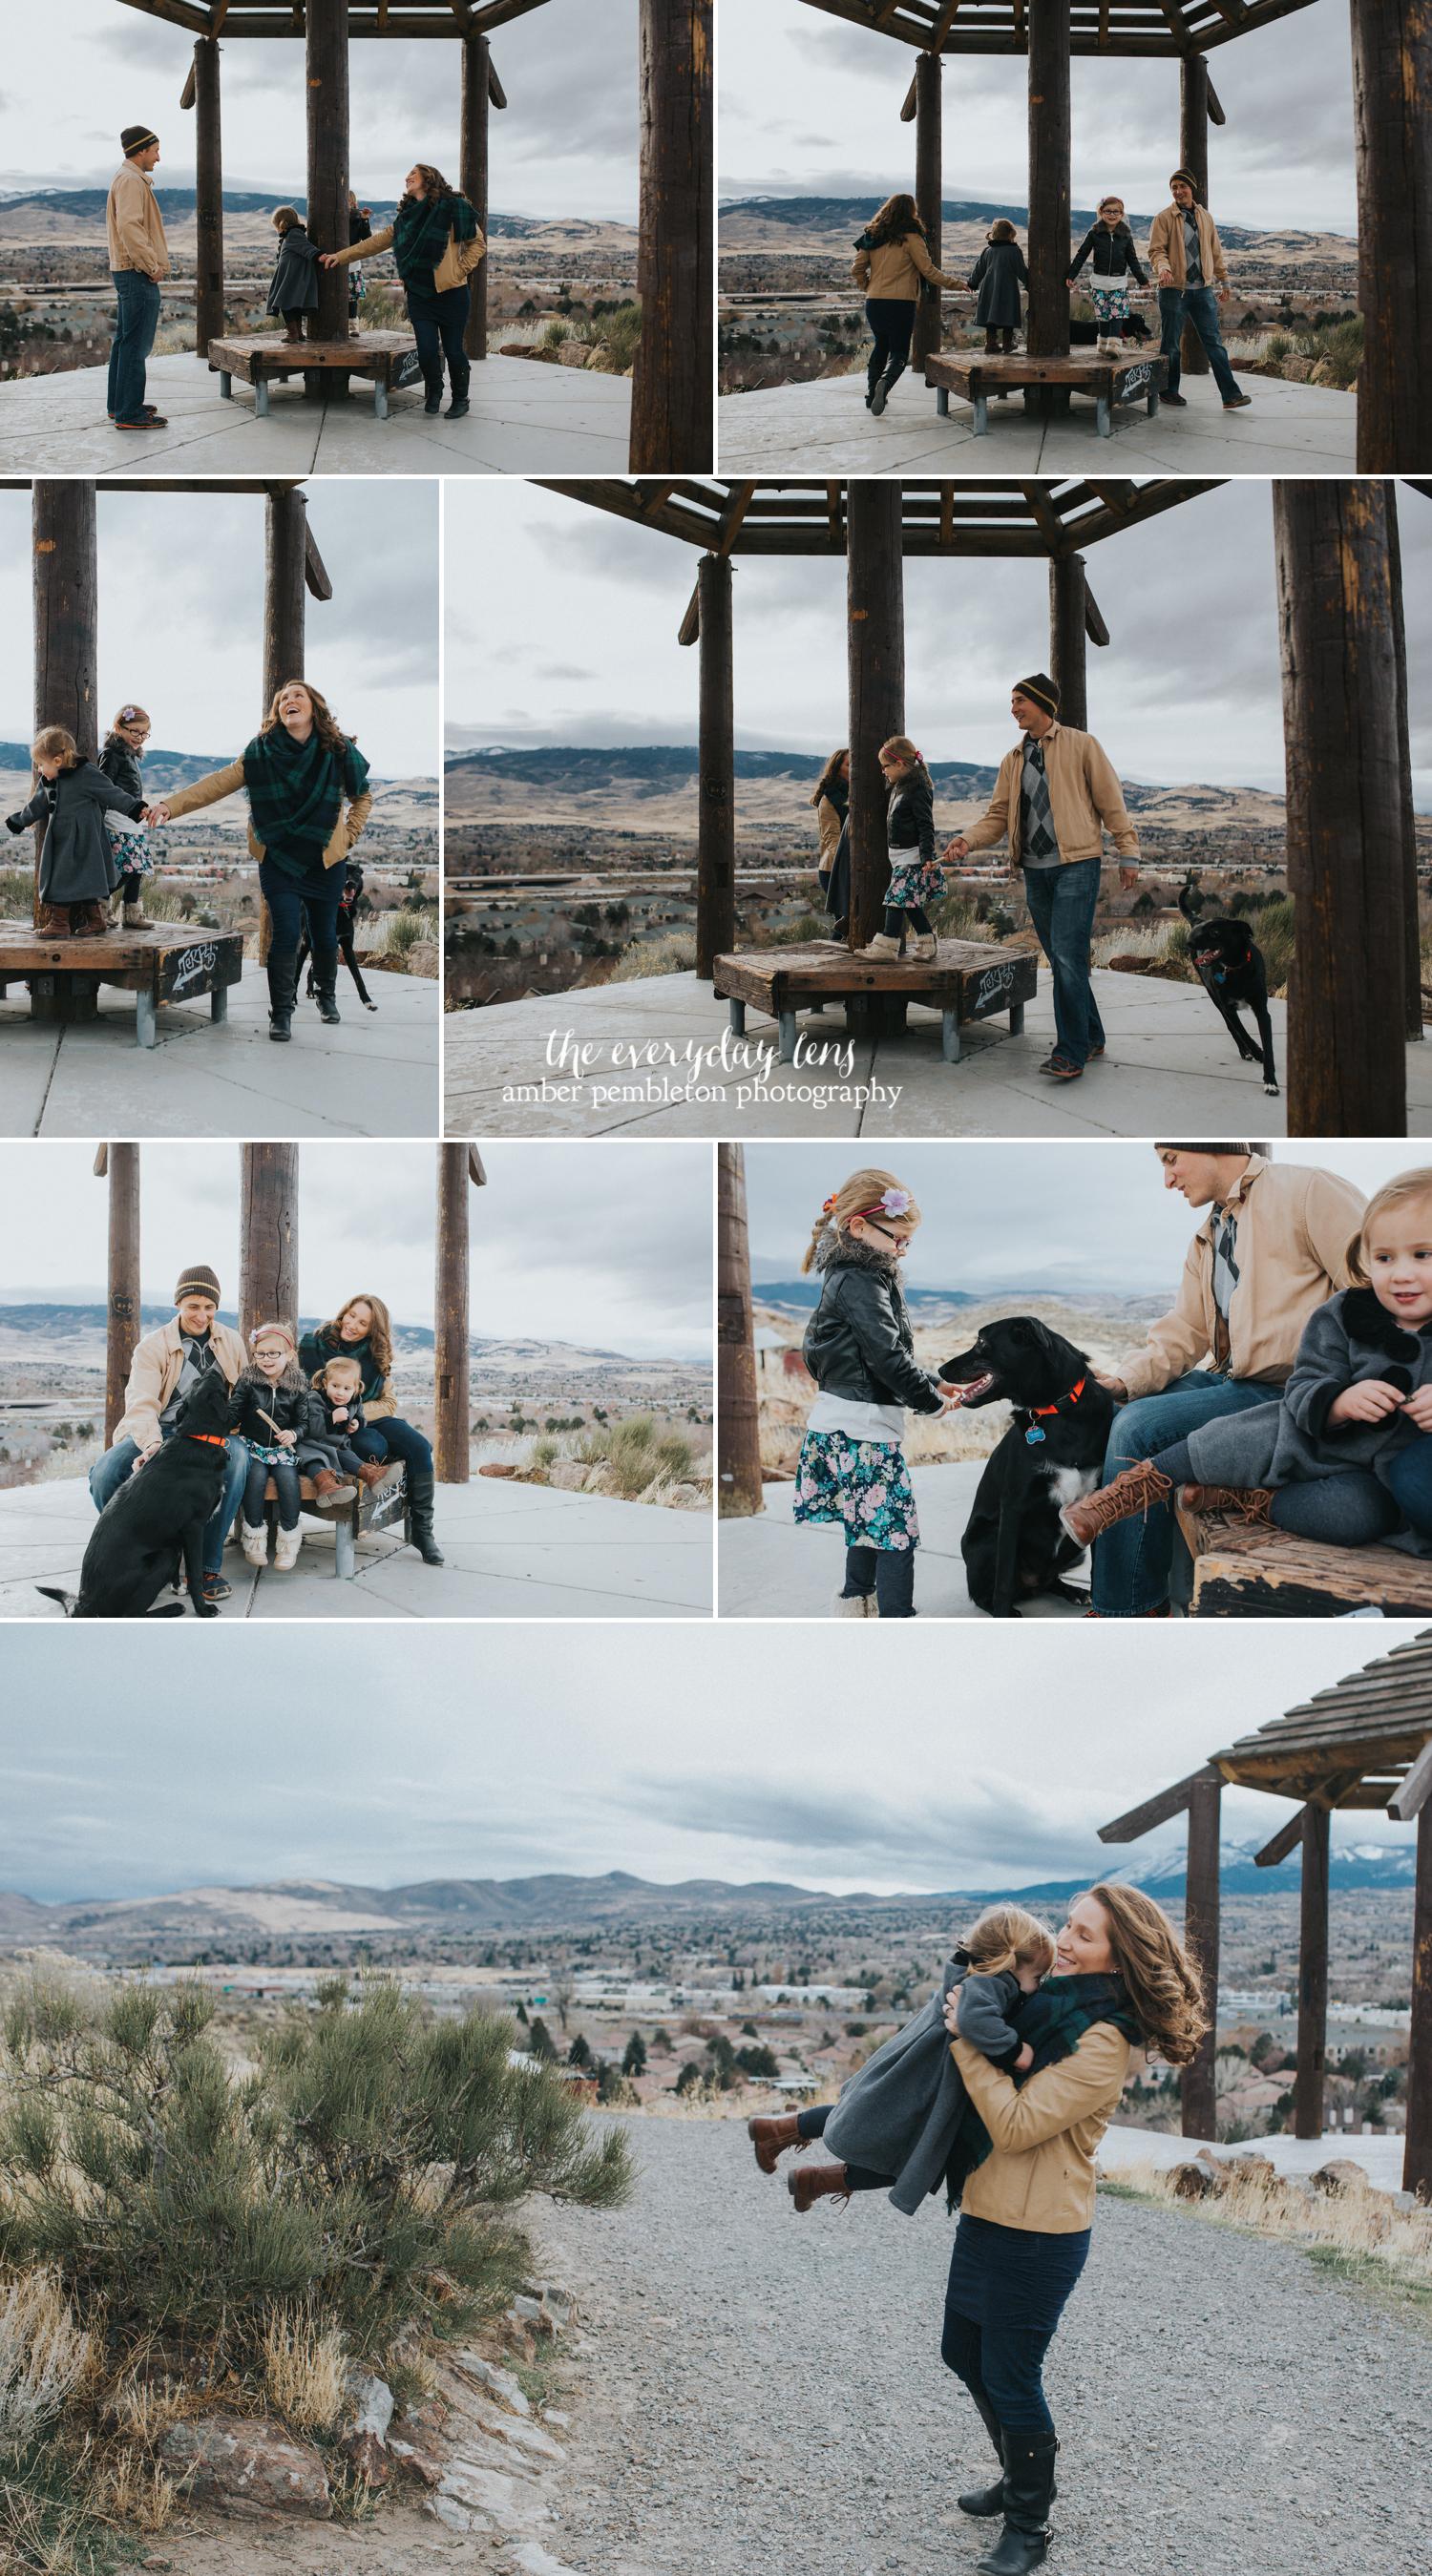 documentary-family-photography-session-reno-nv.jpg